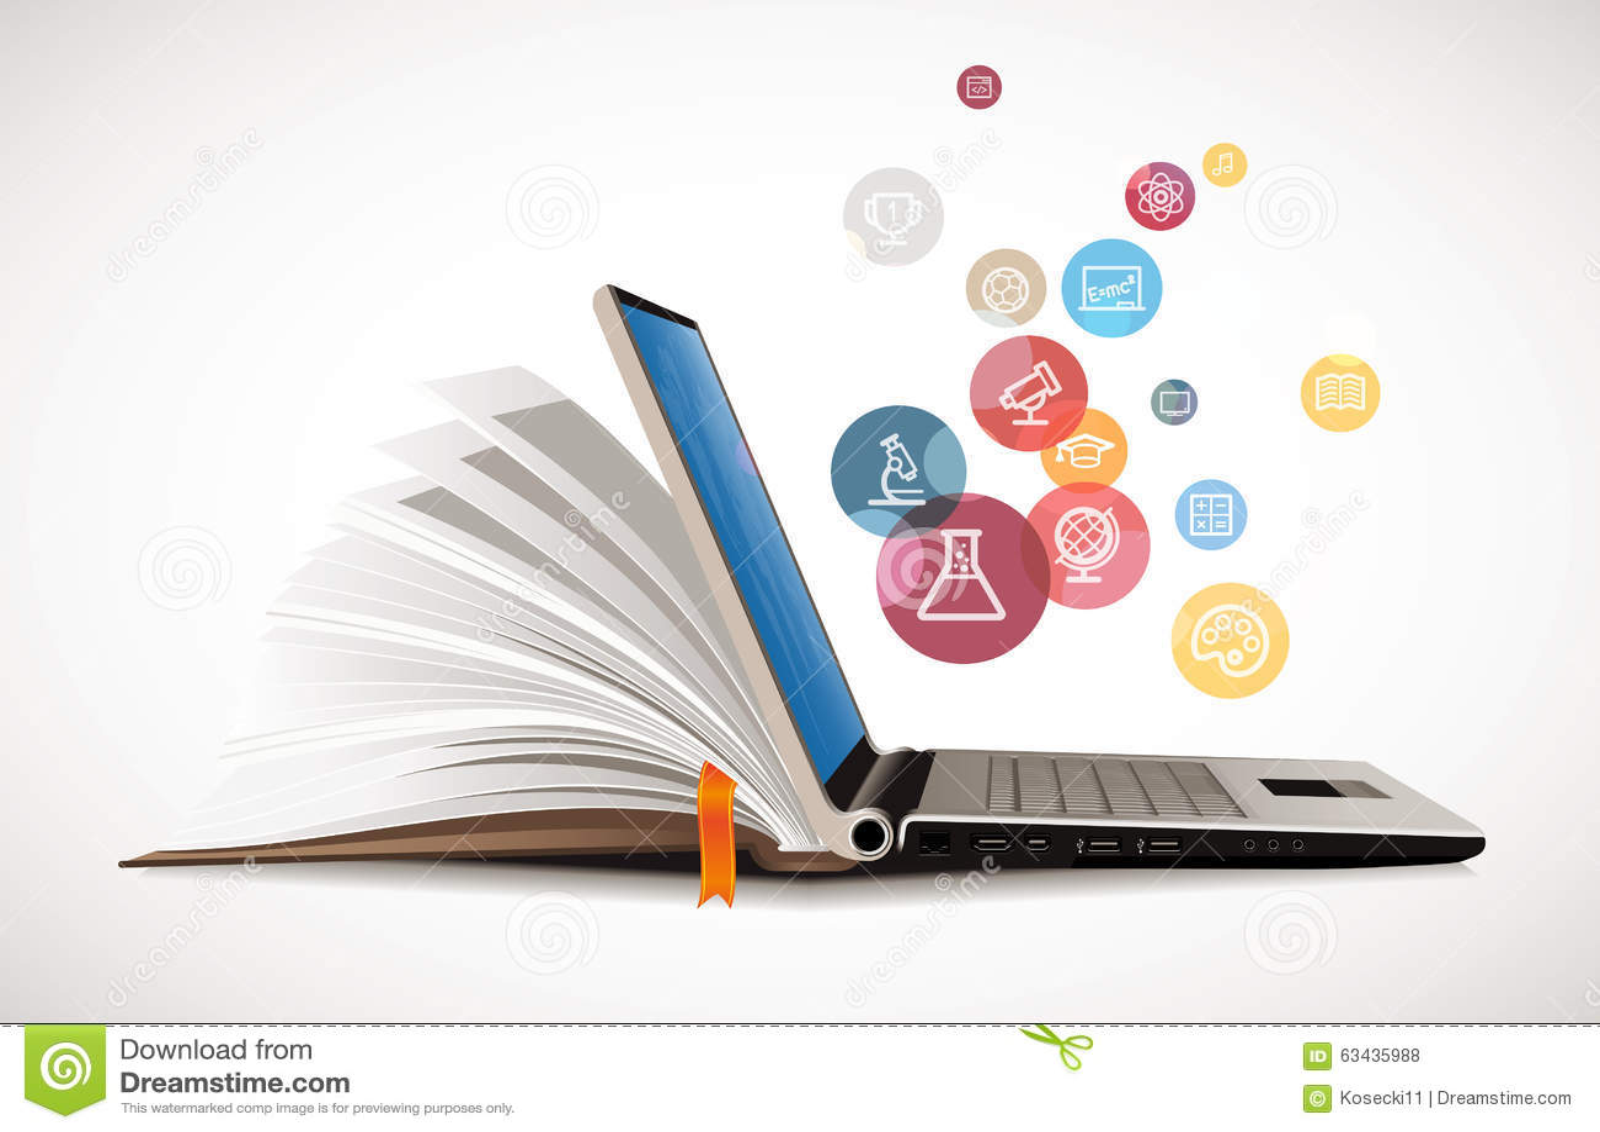 Communication informatique - apprentissage en ligne